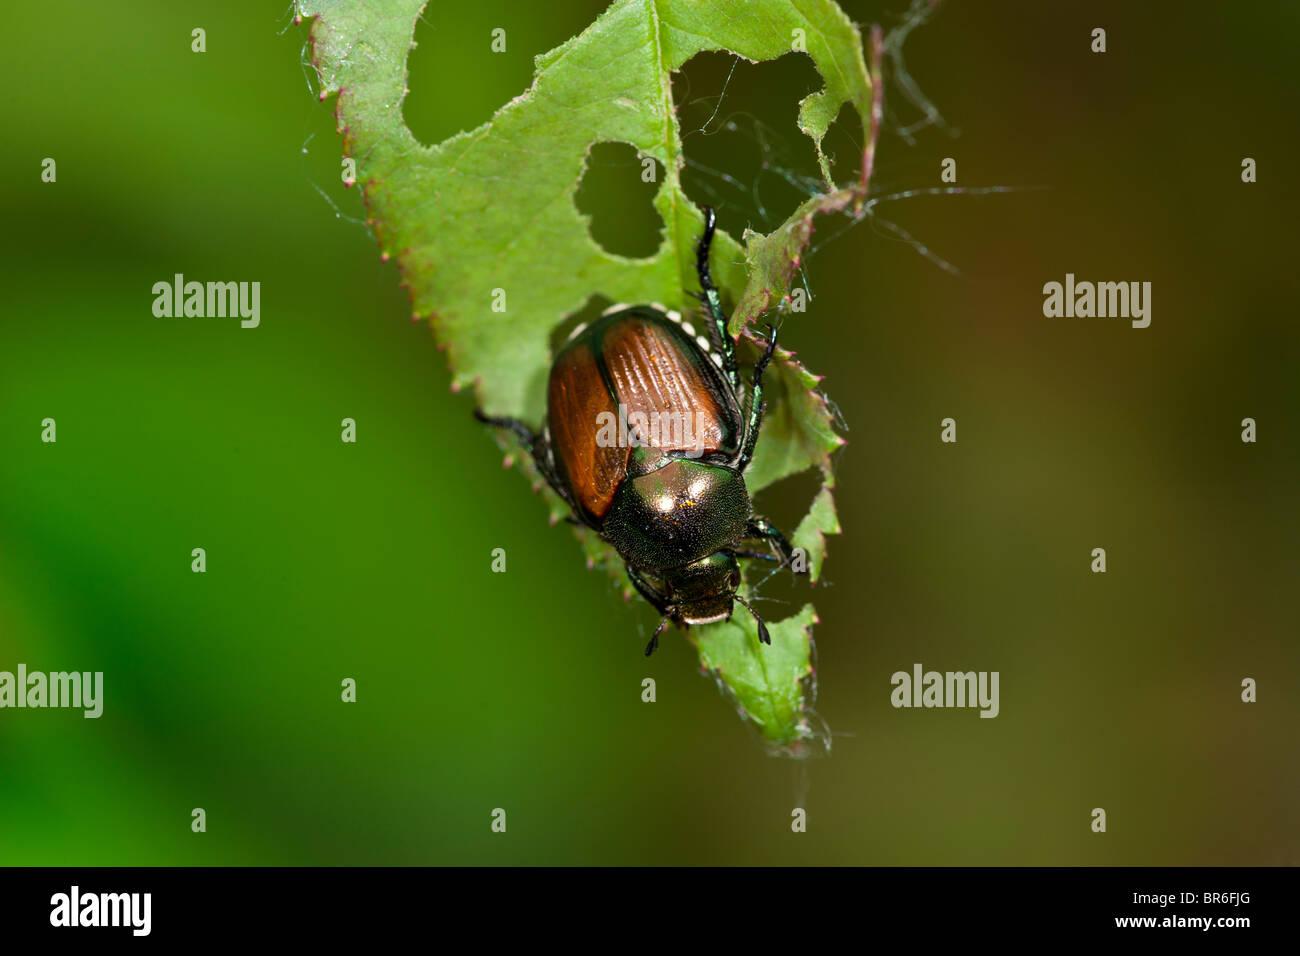 Japanese Beetle eating Rose plant leaves - Stock Image